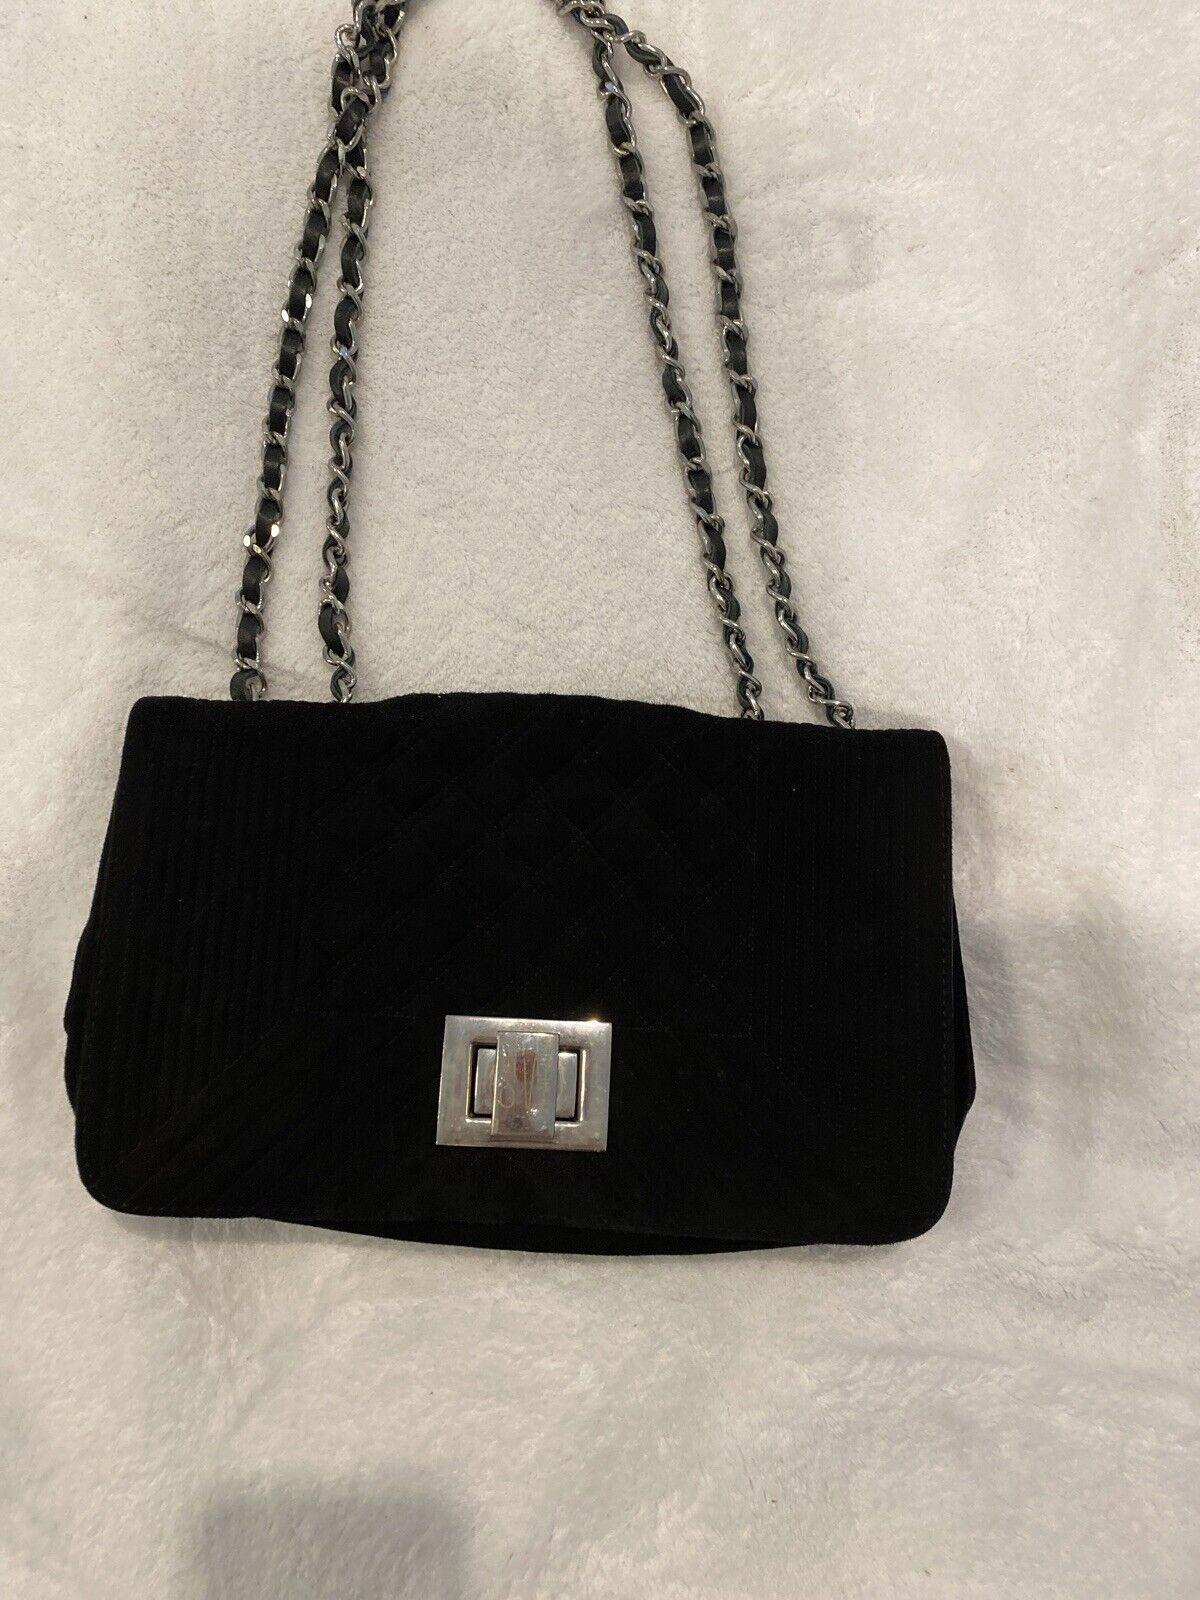 Stuart Weitzman Stitchup Handbag